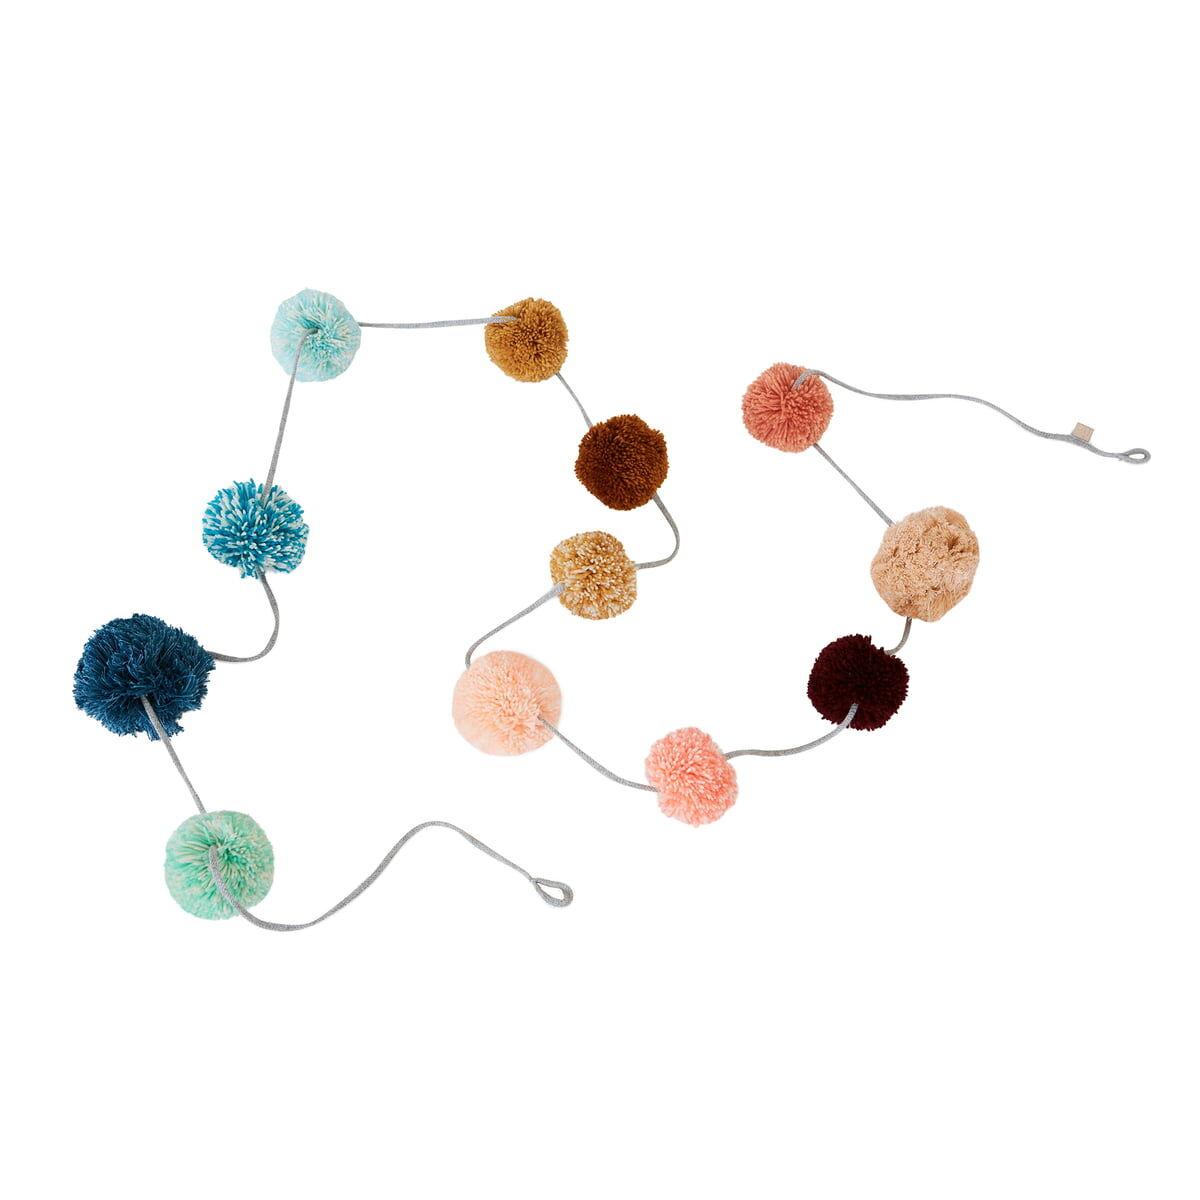 OYOY - Pom Pom Girlande, mehrfarbig